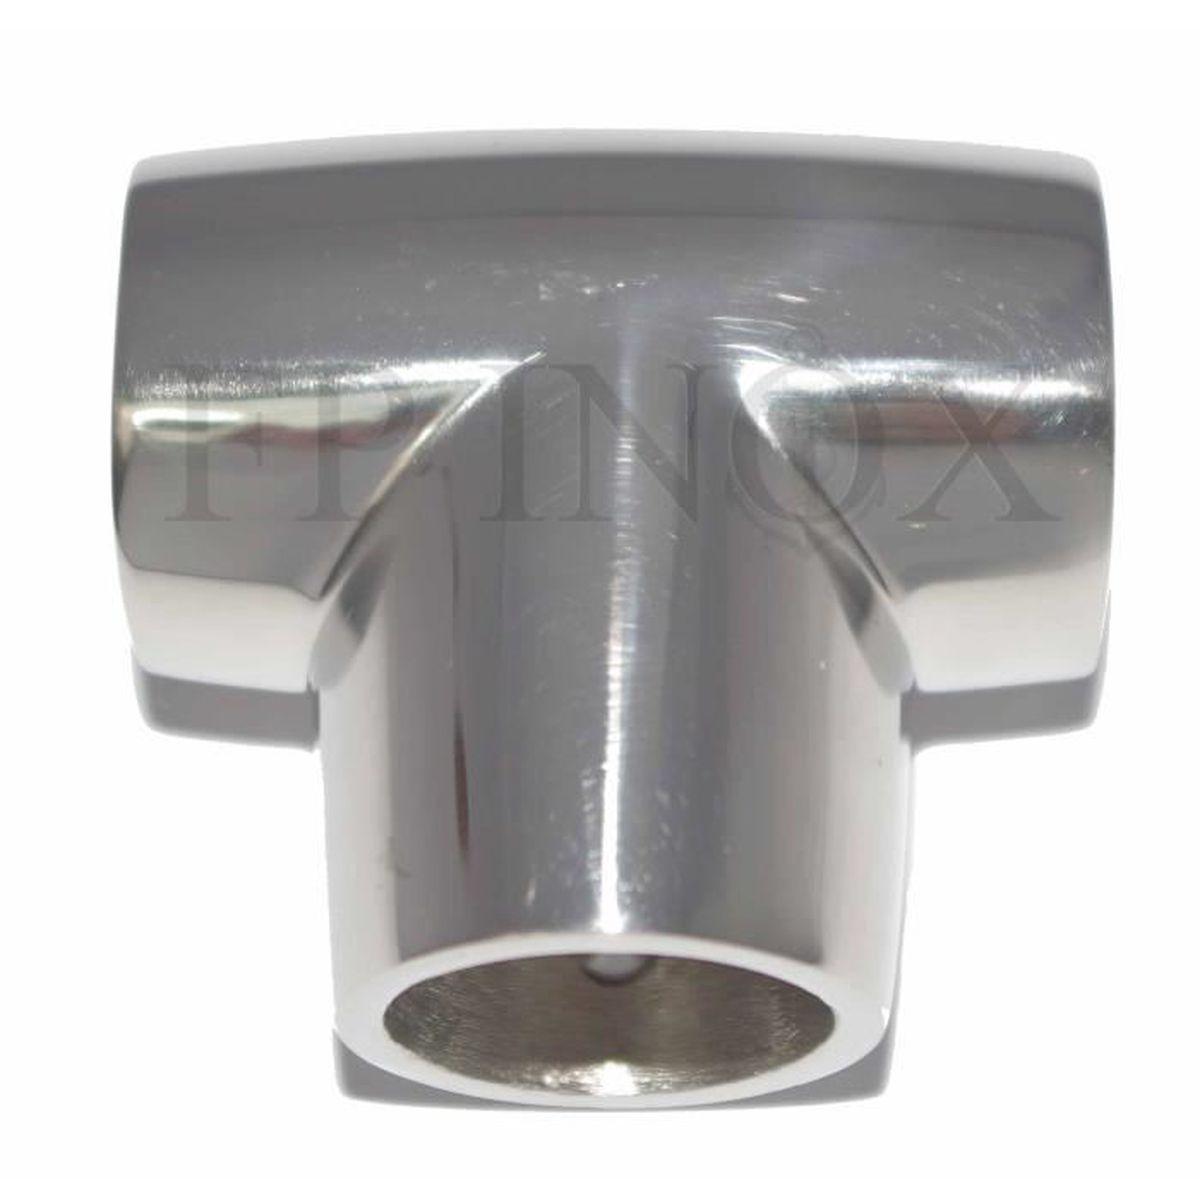 Collier inox 30mm inox 316 A4